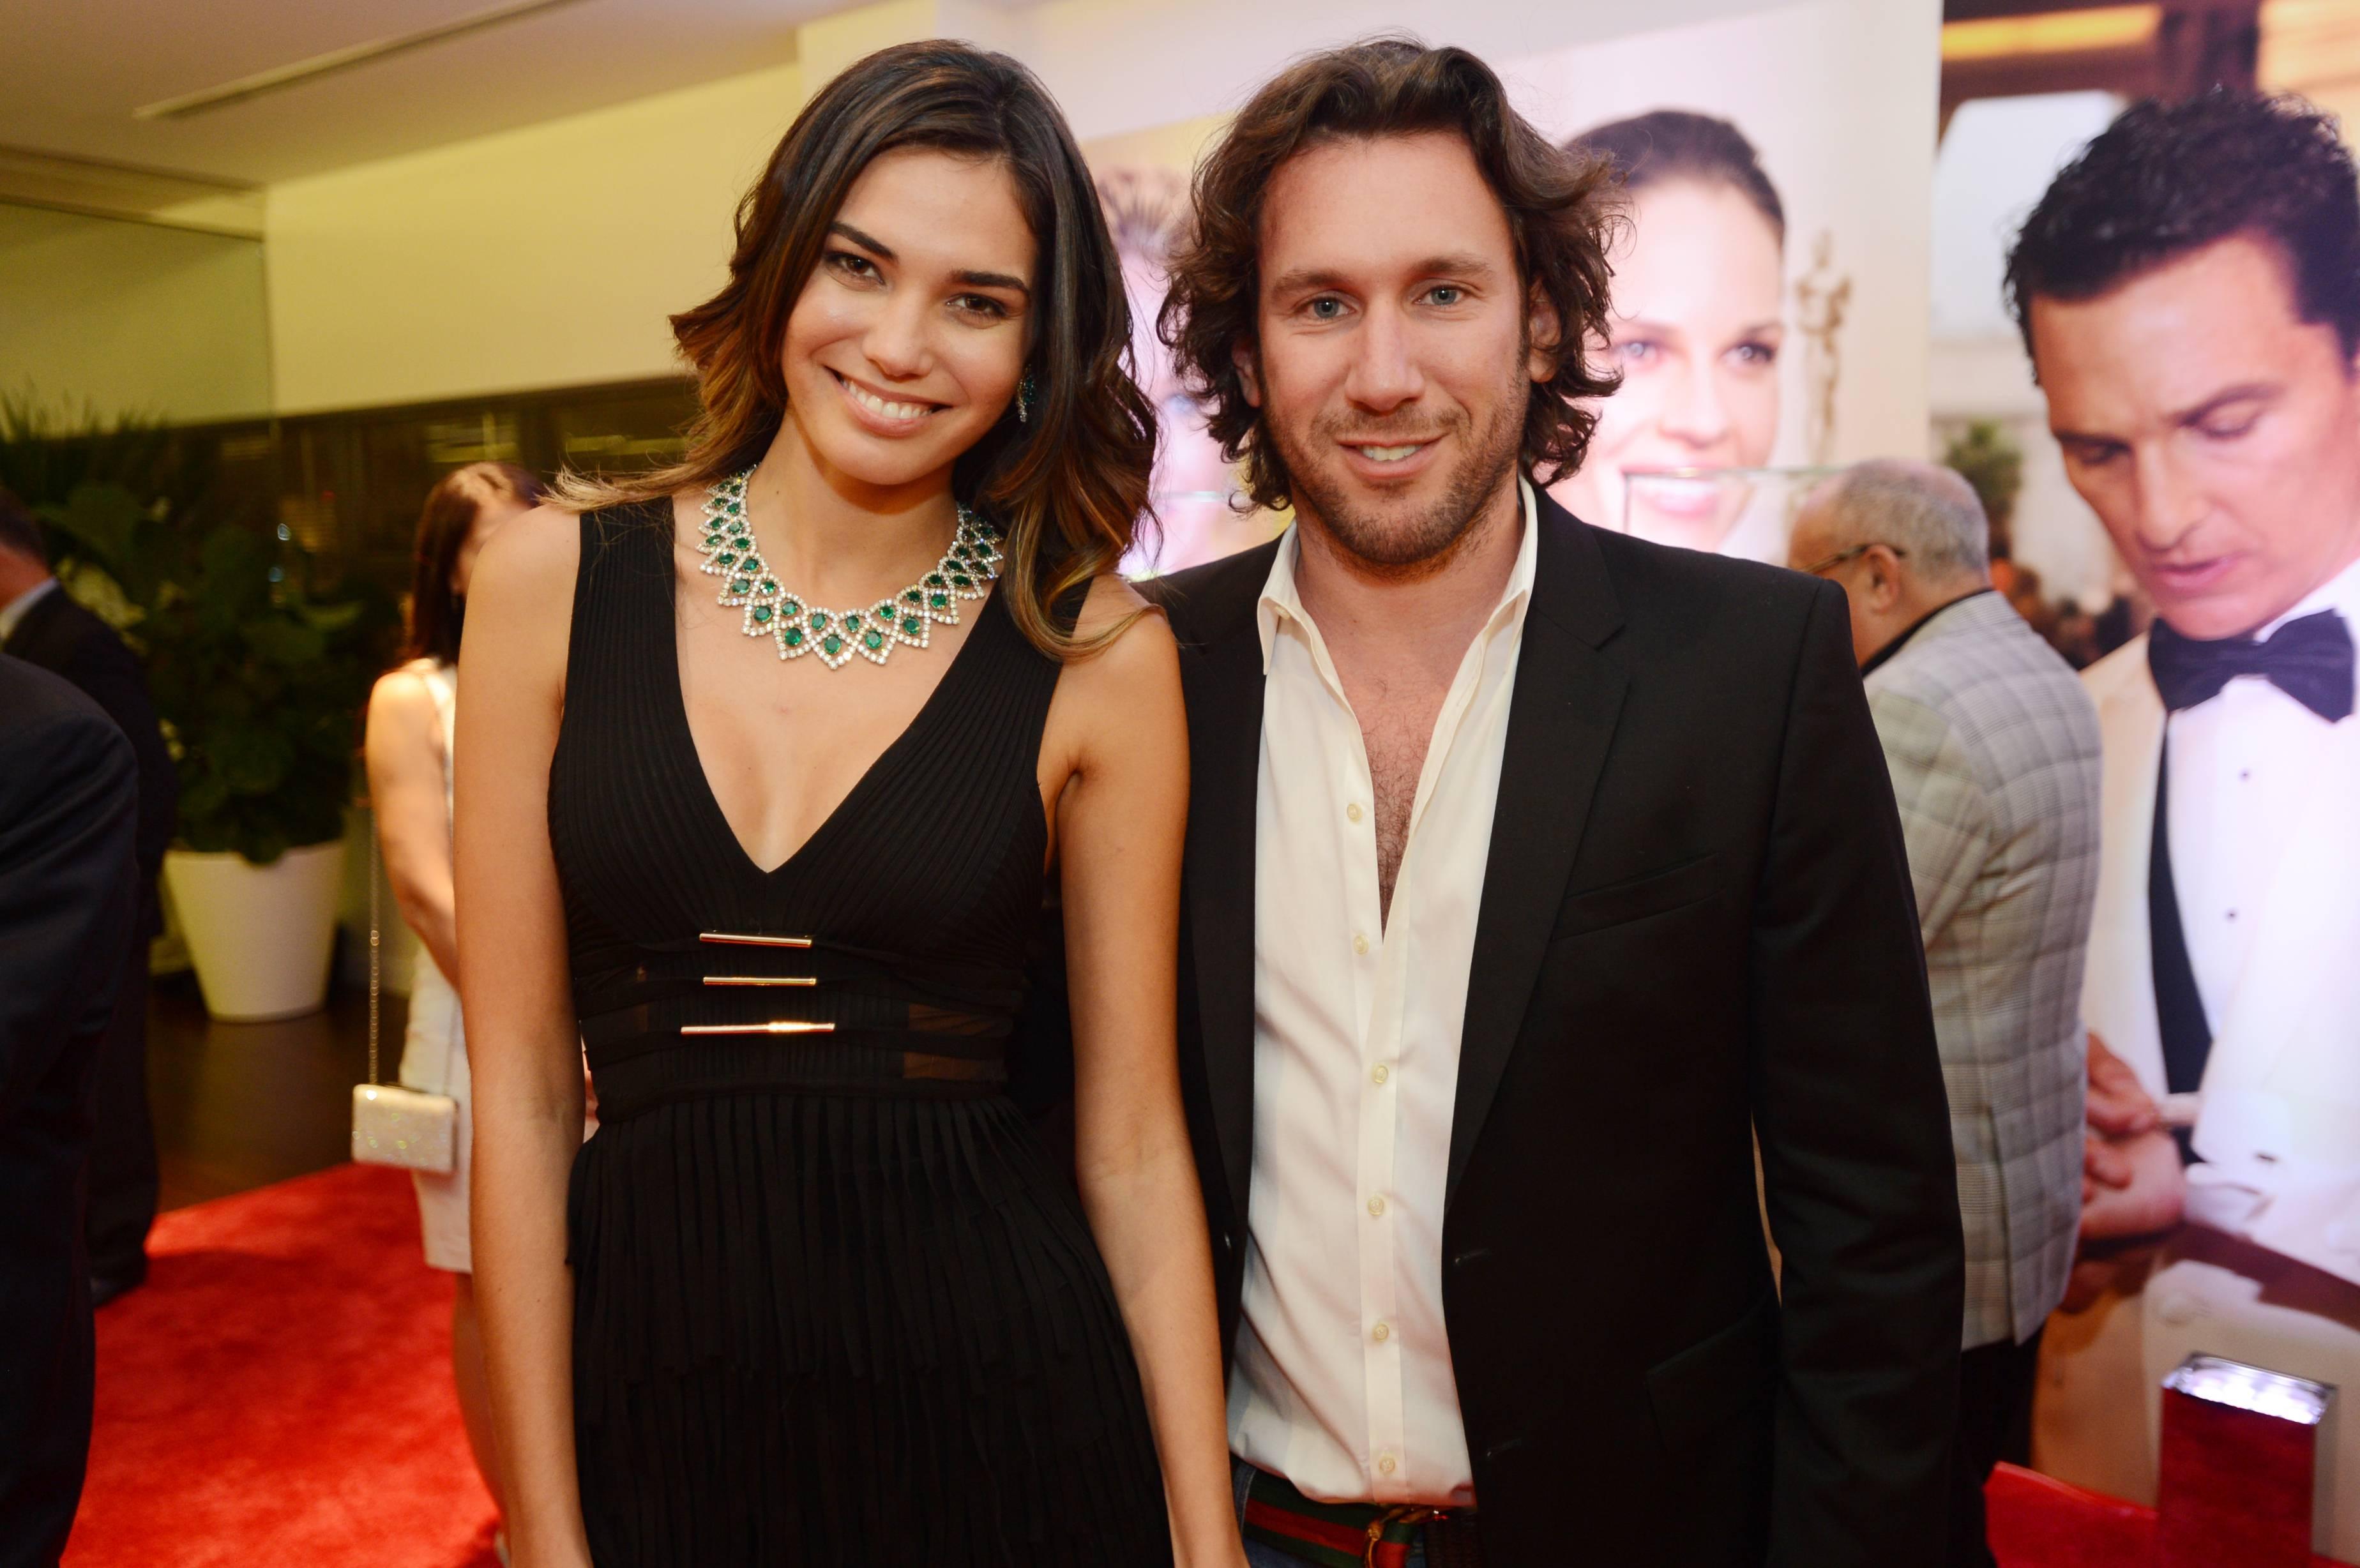 Rachel Vallori & Gustavo Strallnikoff